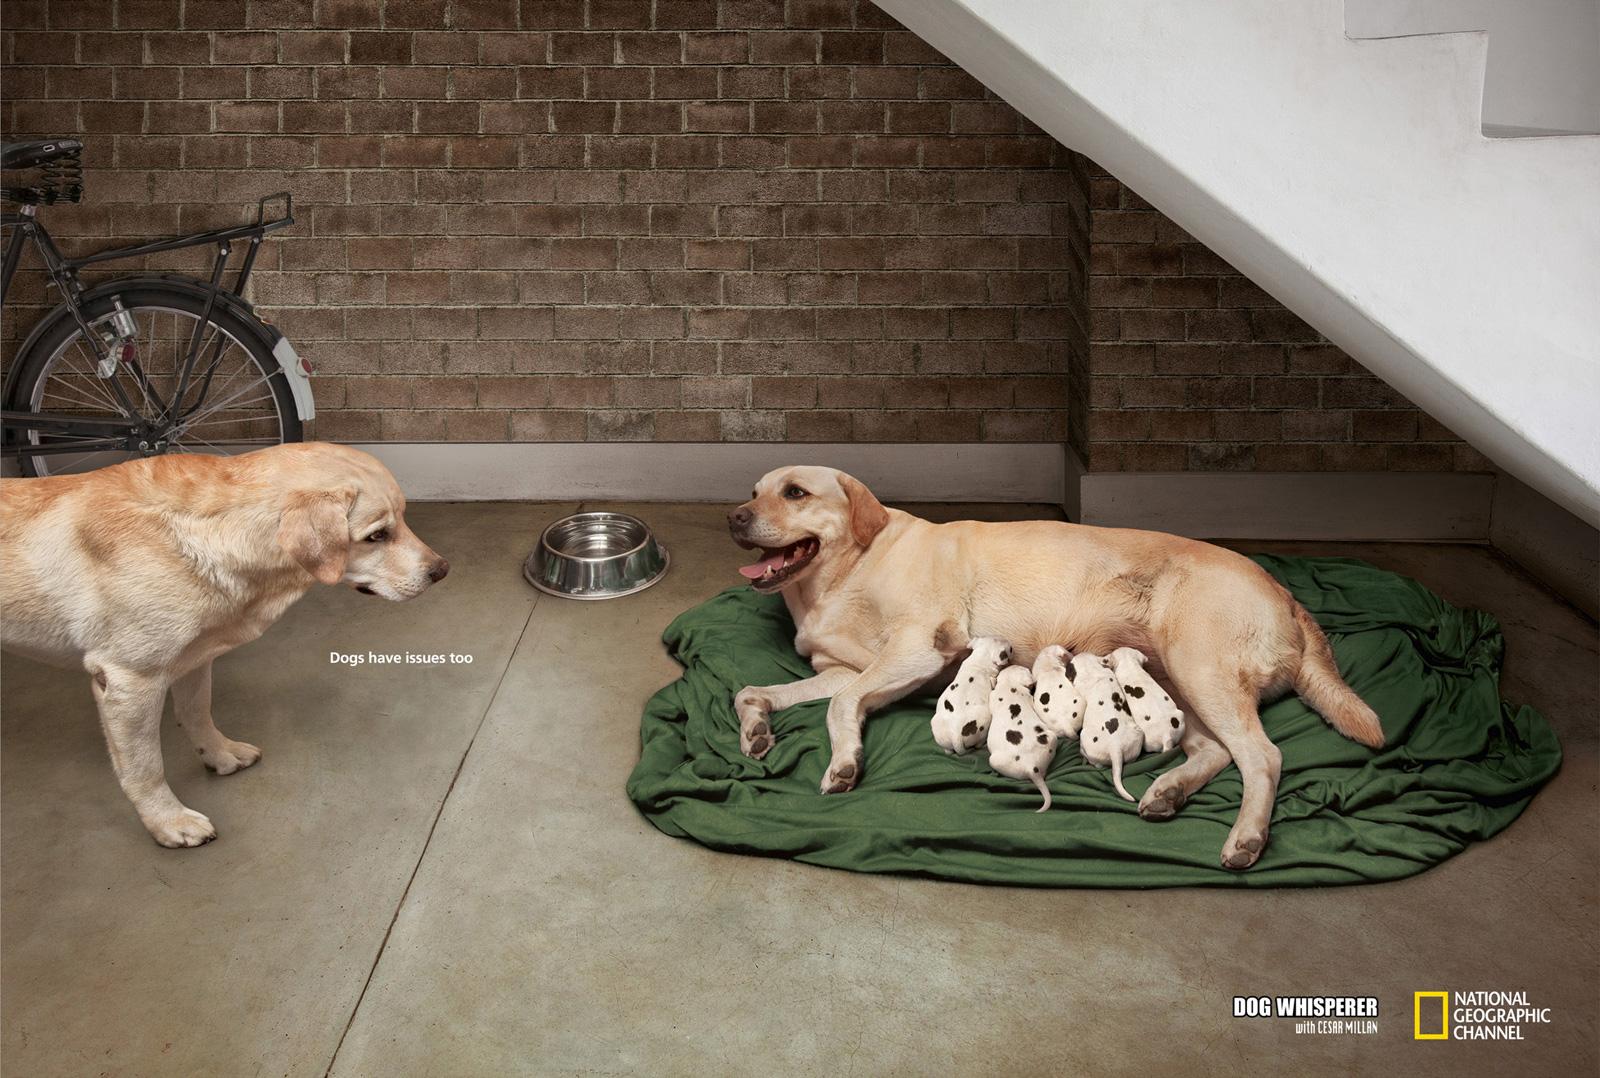 20 best print ads of 2012